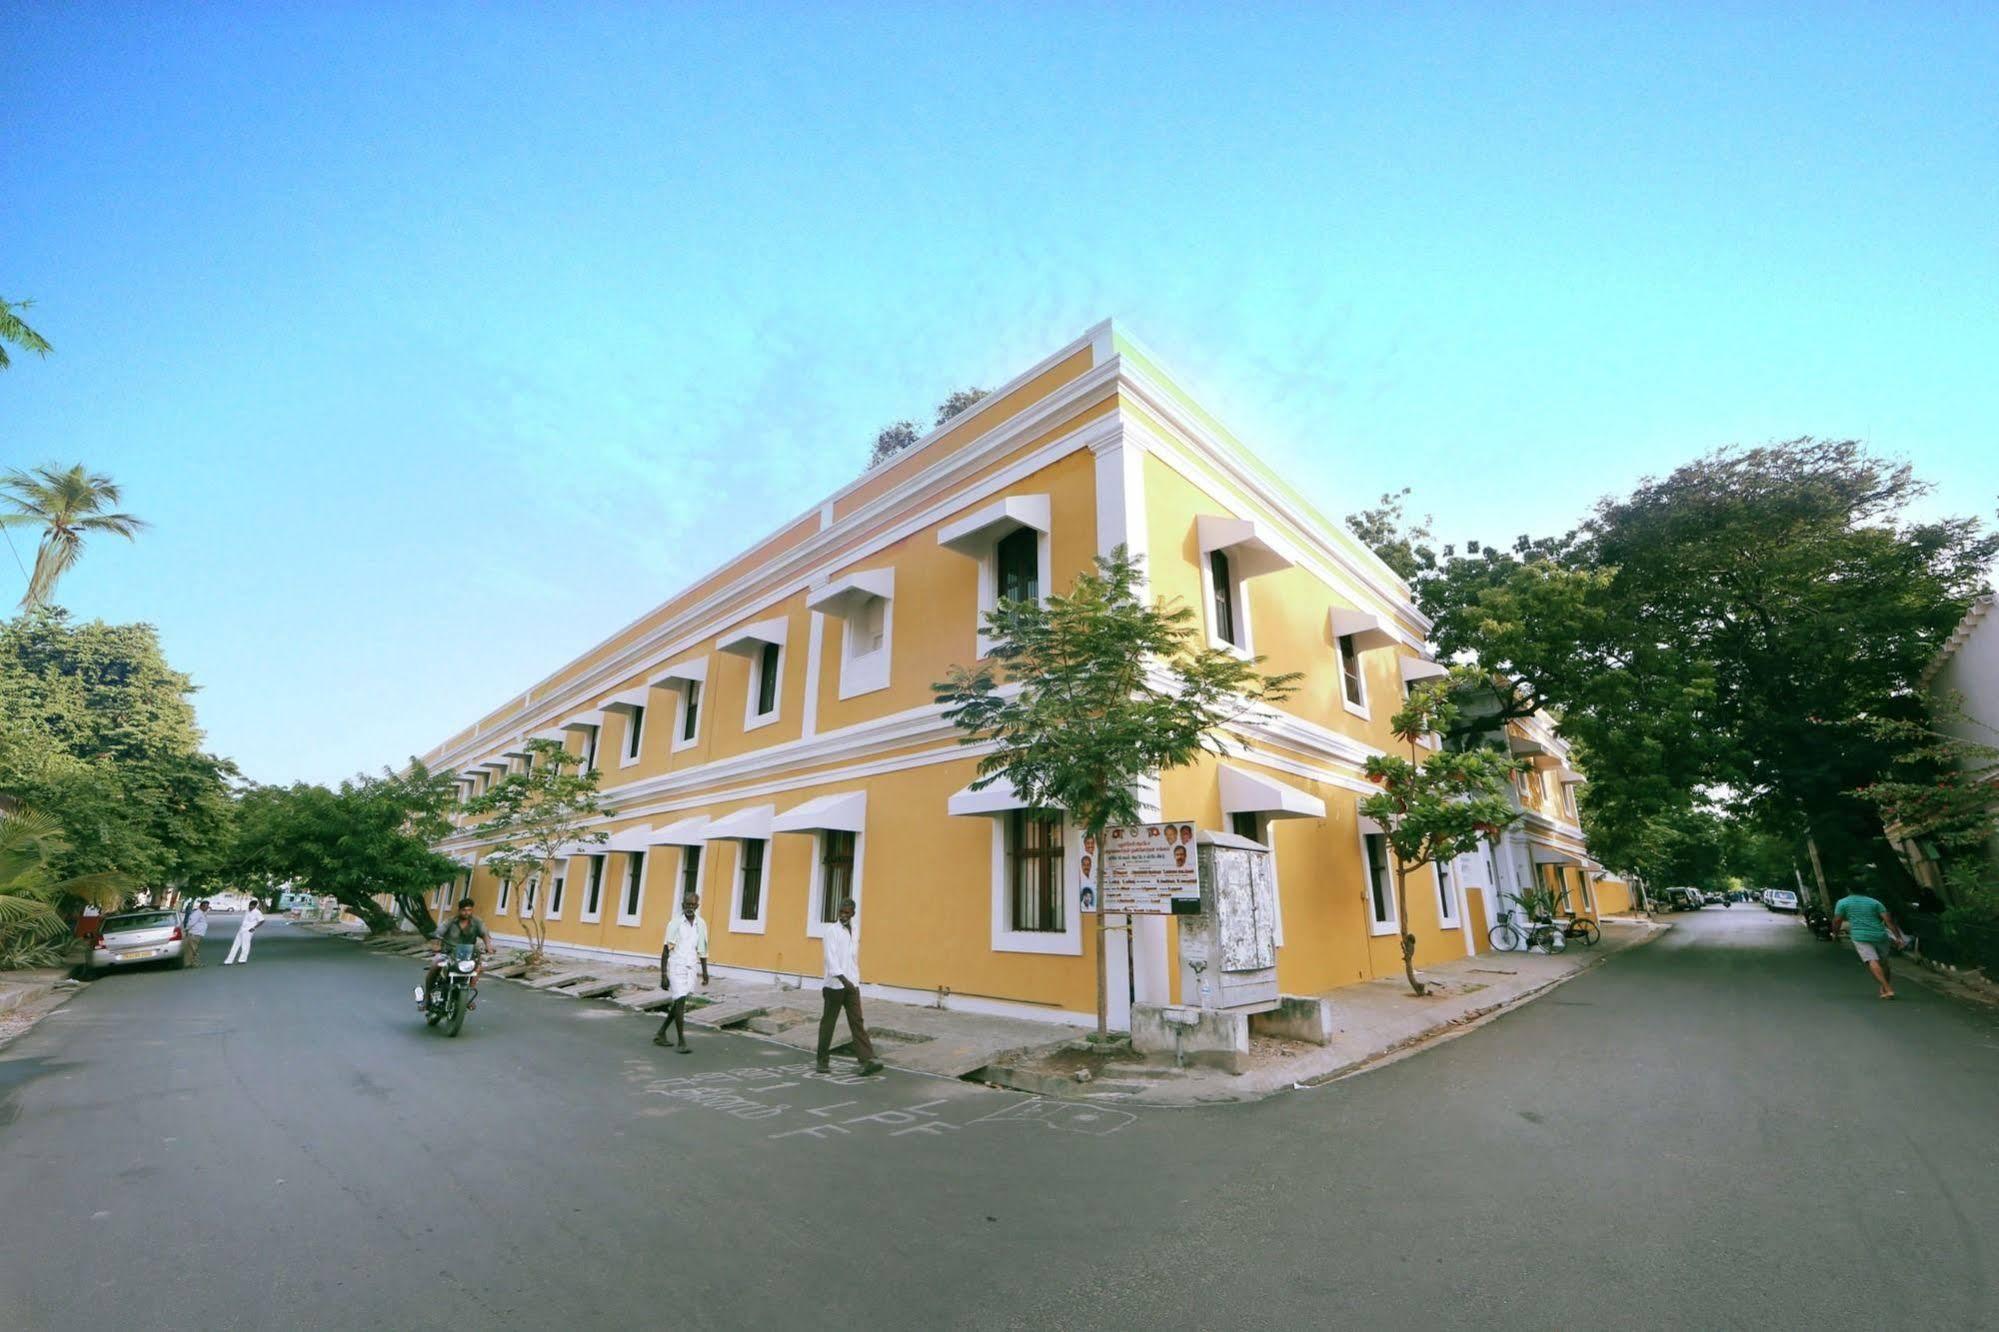 Palais De Mahe, Pondicherry Image 3